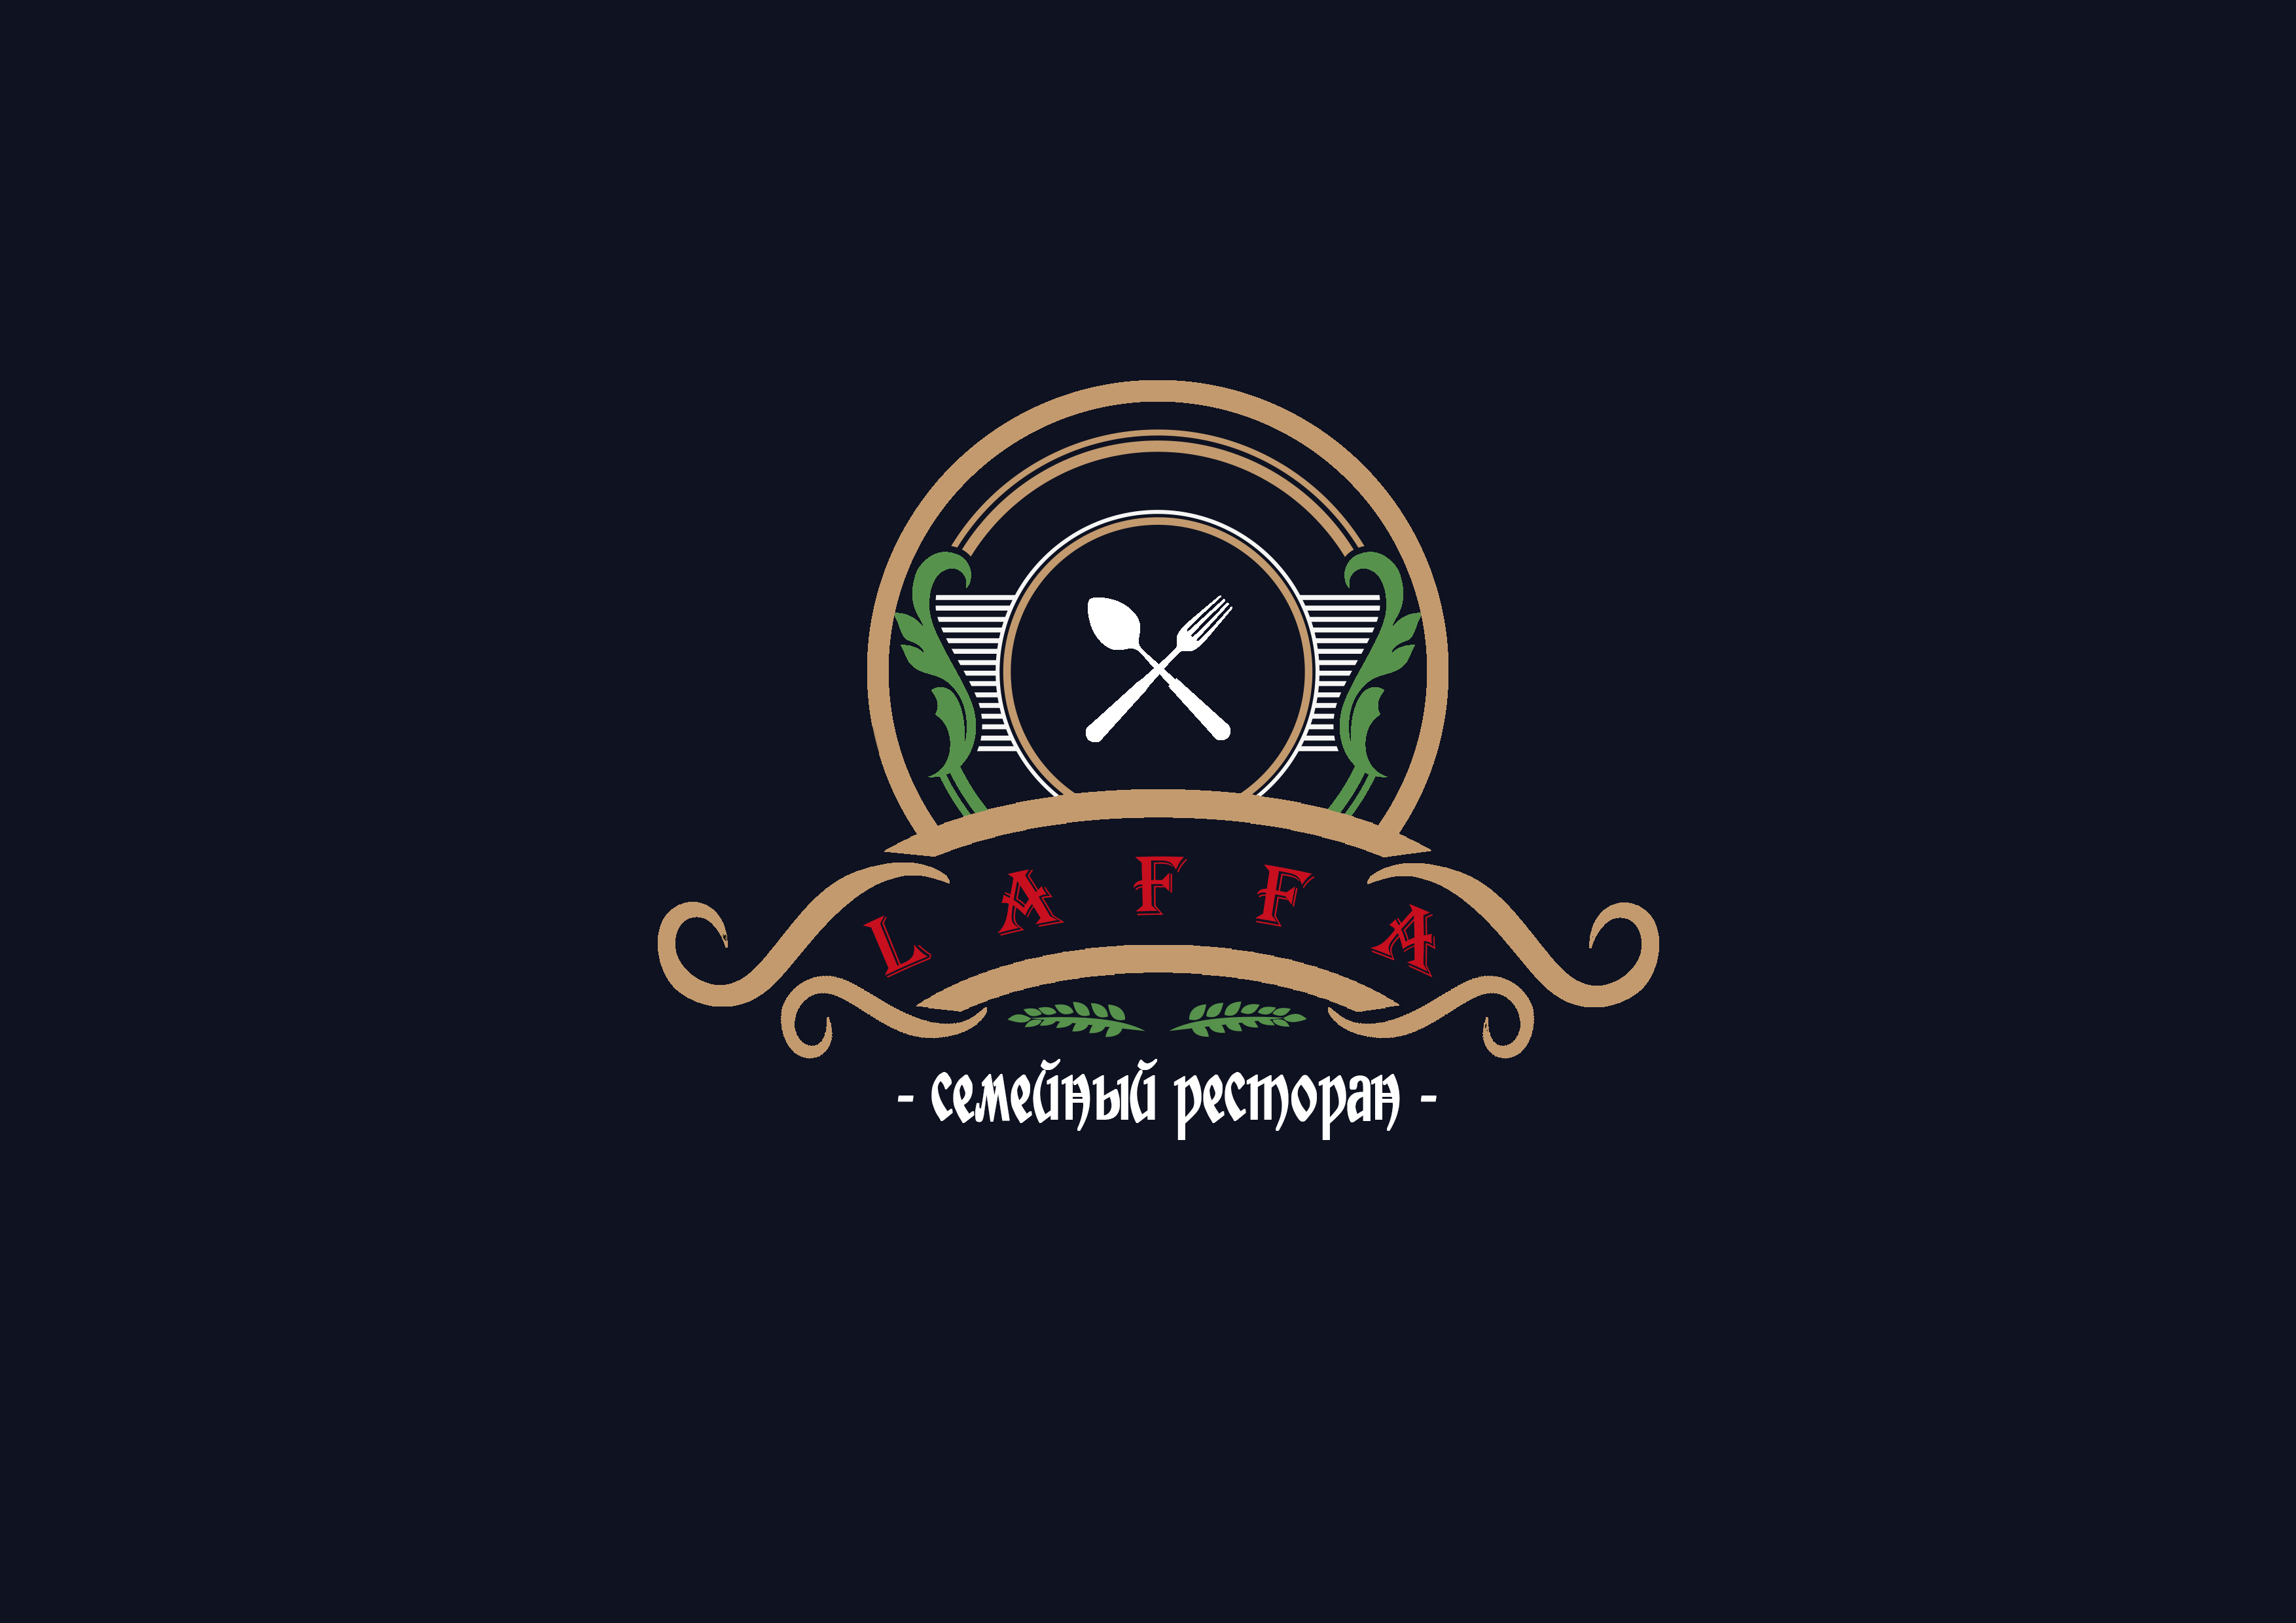 Нужно нарисовать логотип для семейного итальянского ресторан фото f_571554aa0dc1db92.jpg